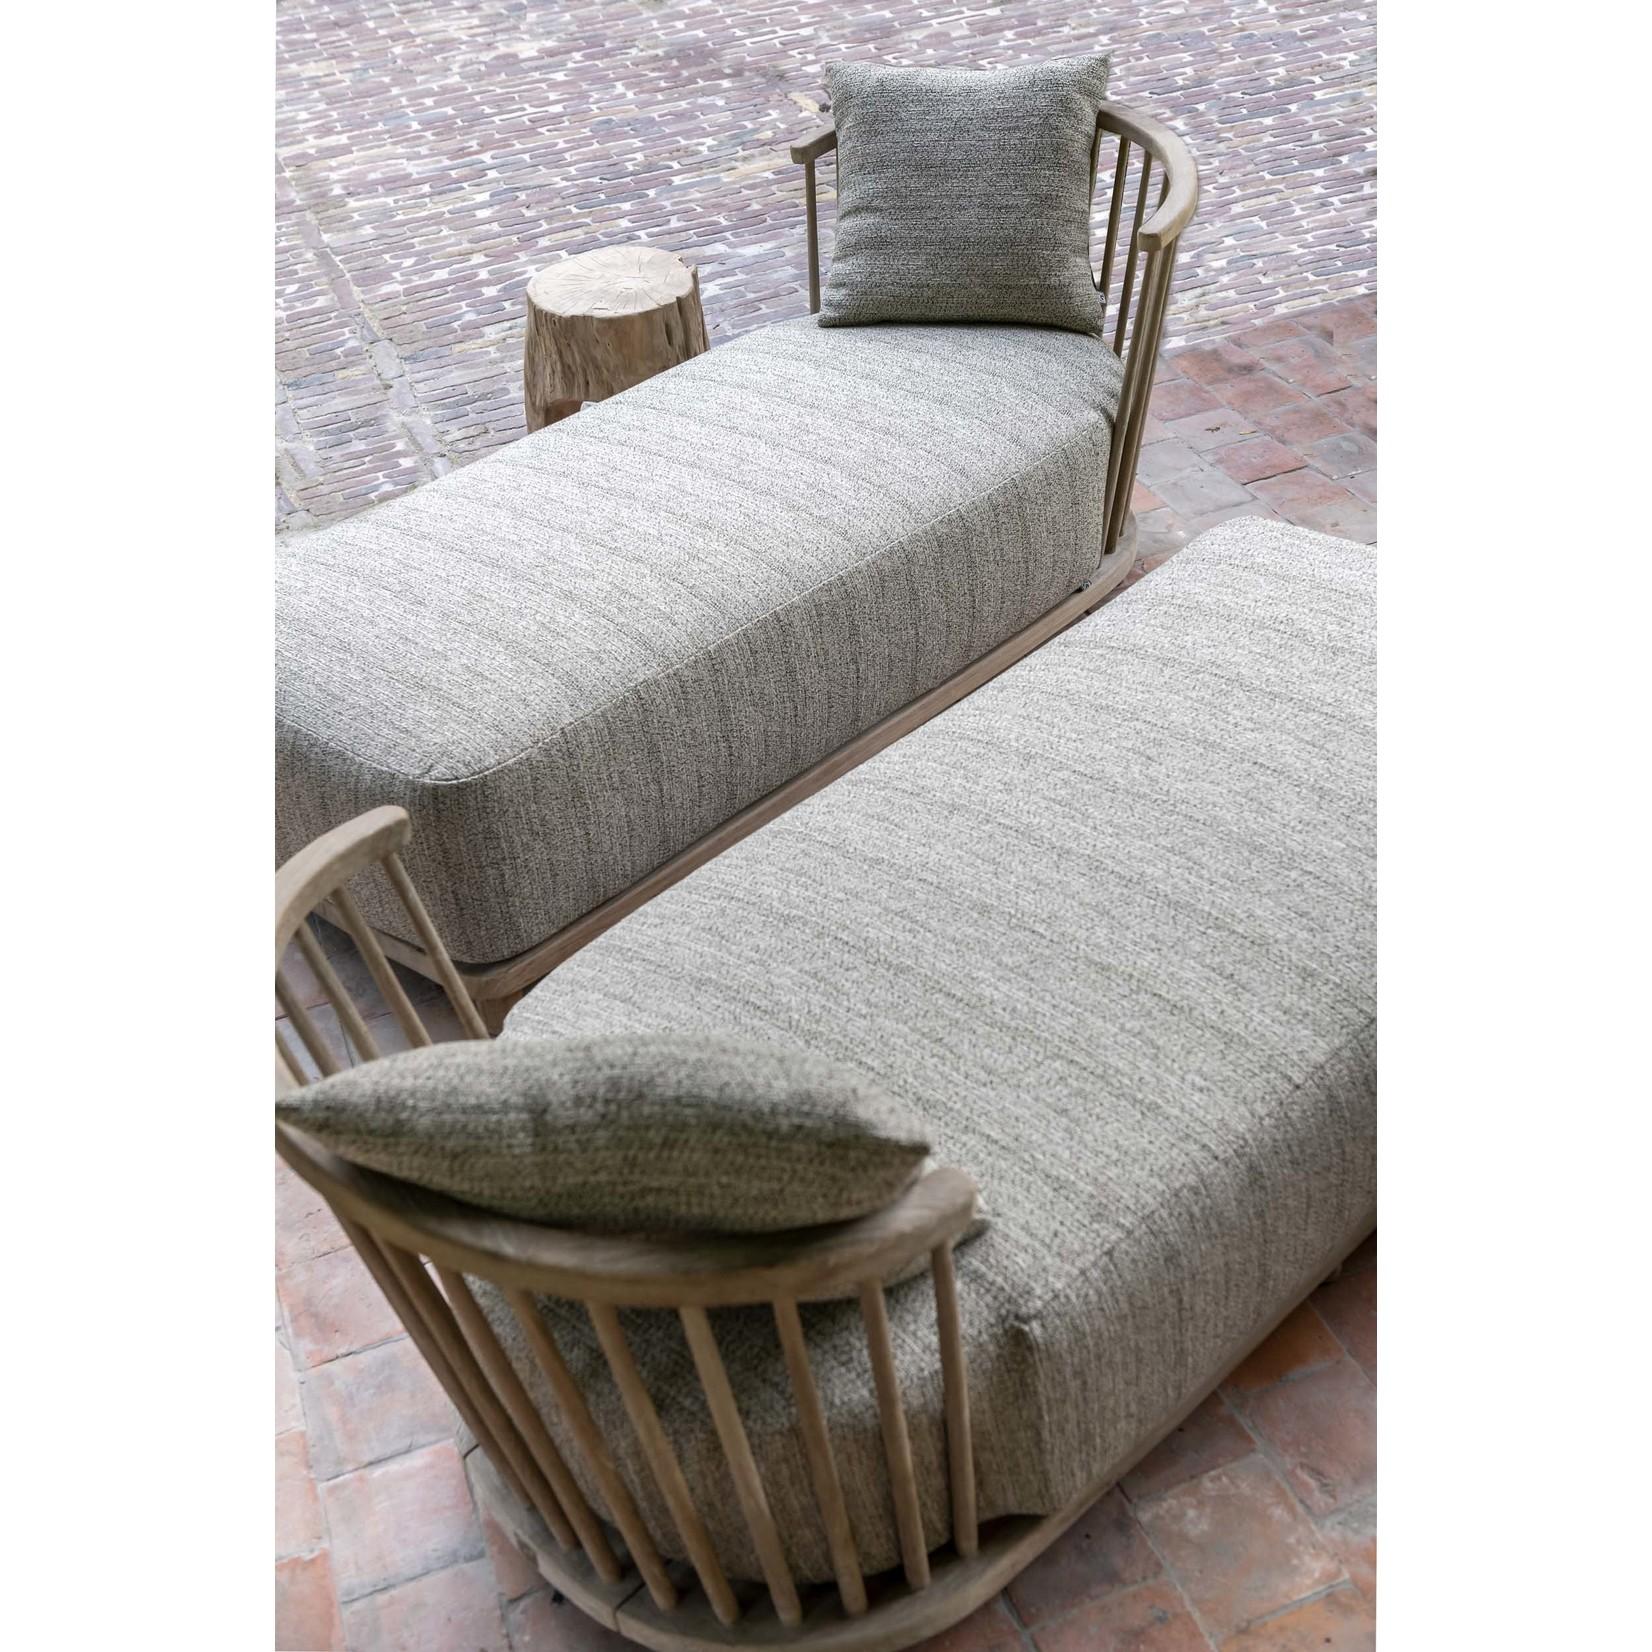 Gommaire Chaise Longue Carol | Reclaimed Teak Natural Gray + Cushion